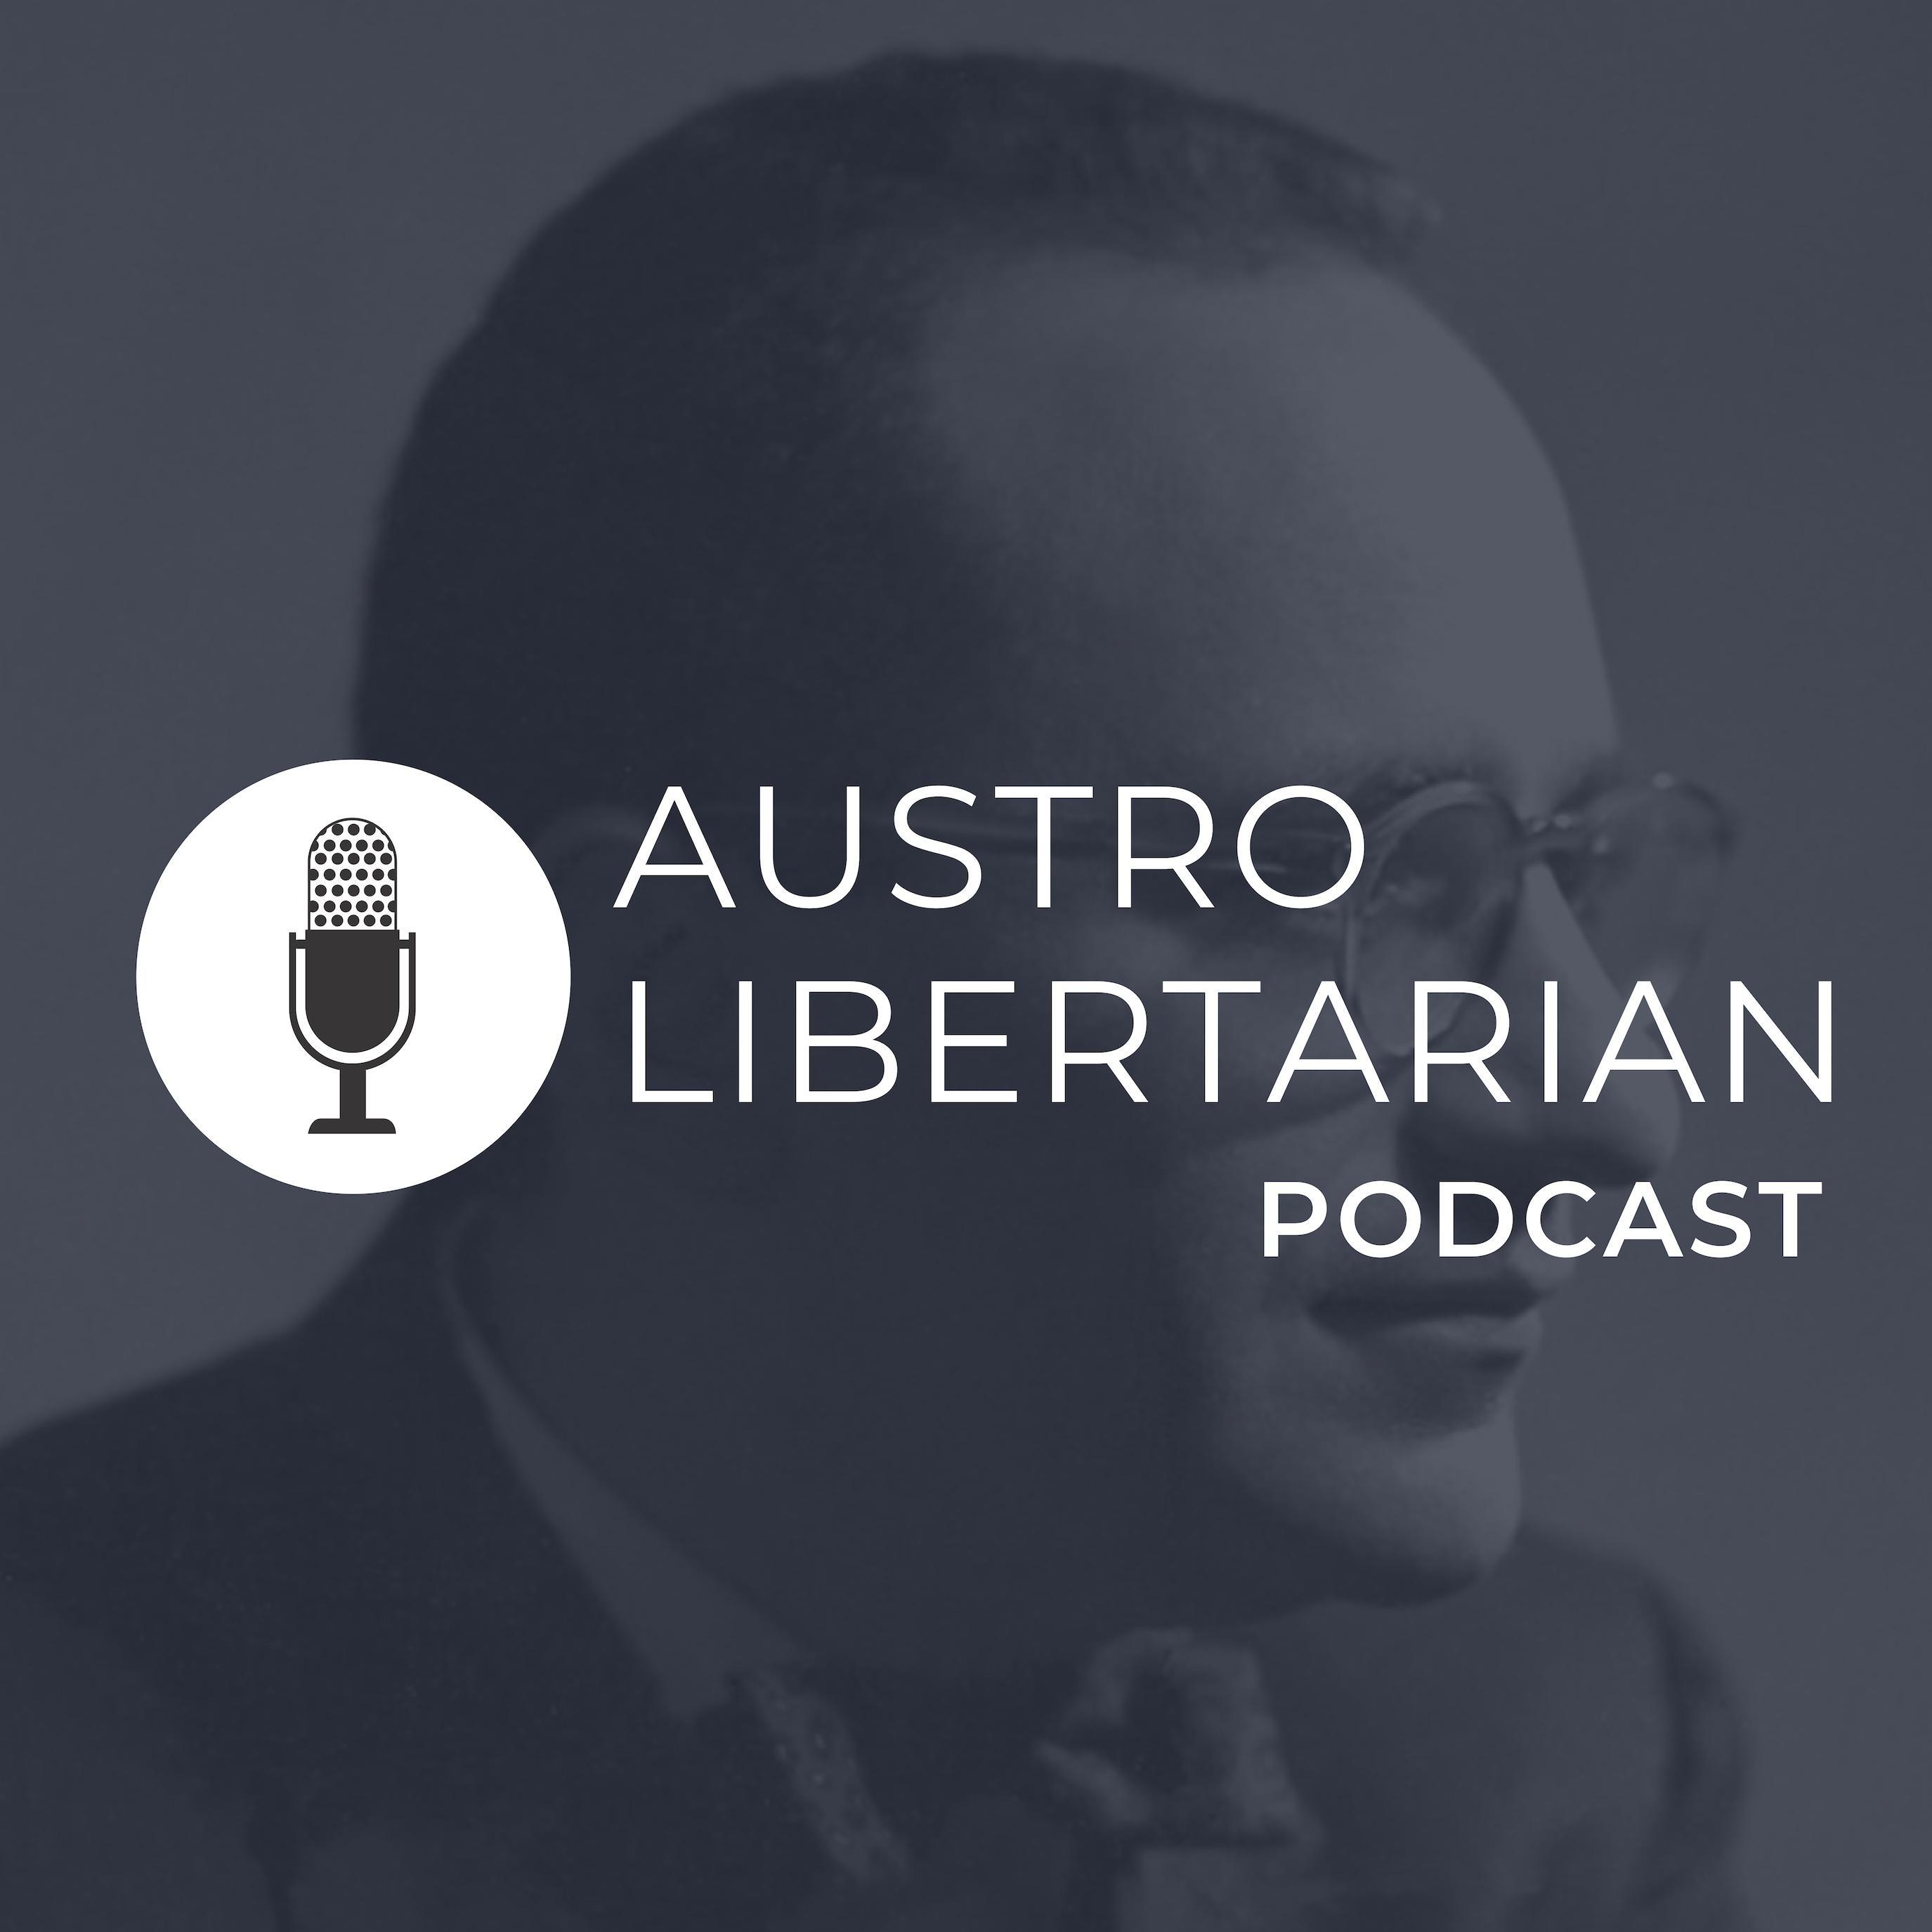 Austro Libertarian